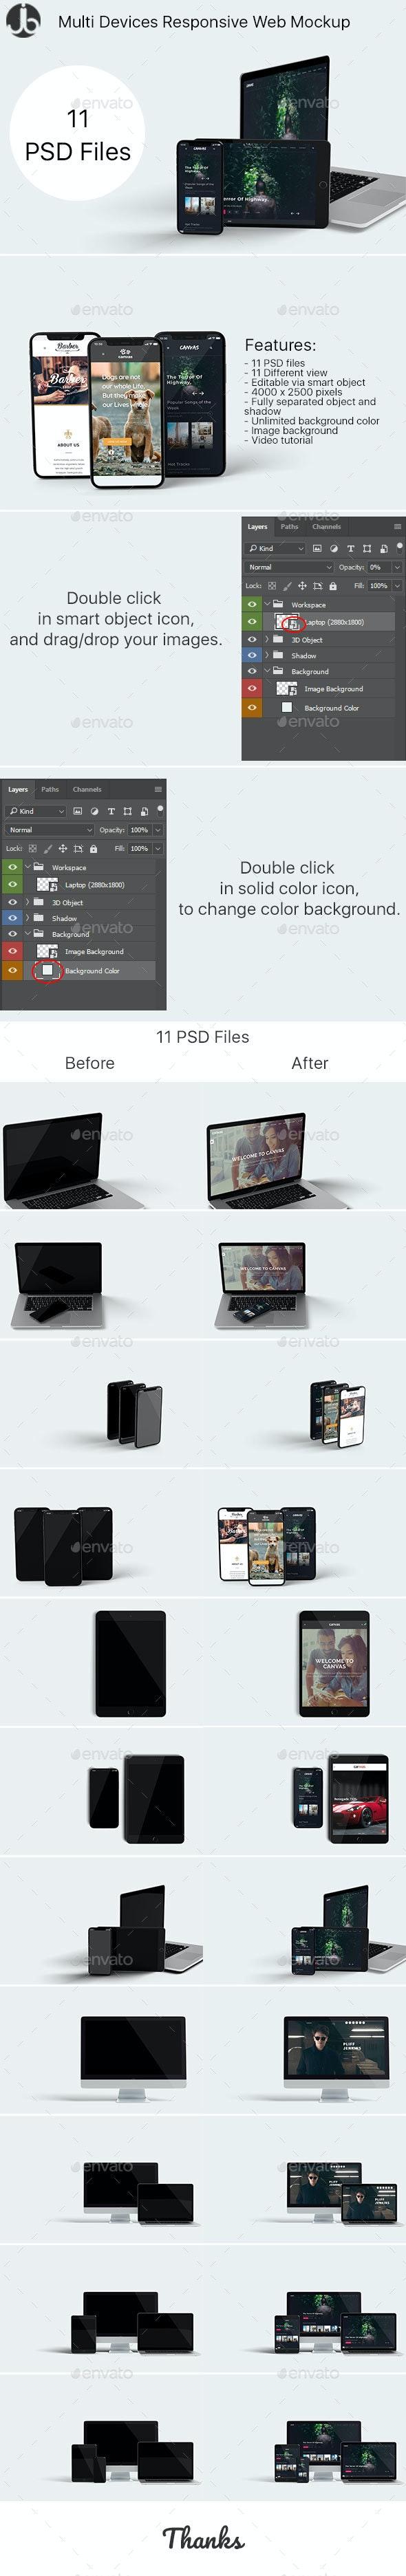 Multi Devices Responsive Website Mockup - Monitors Displays